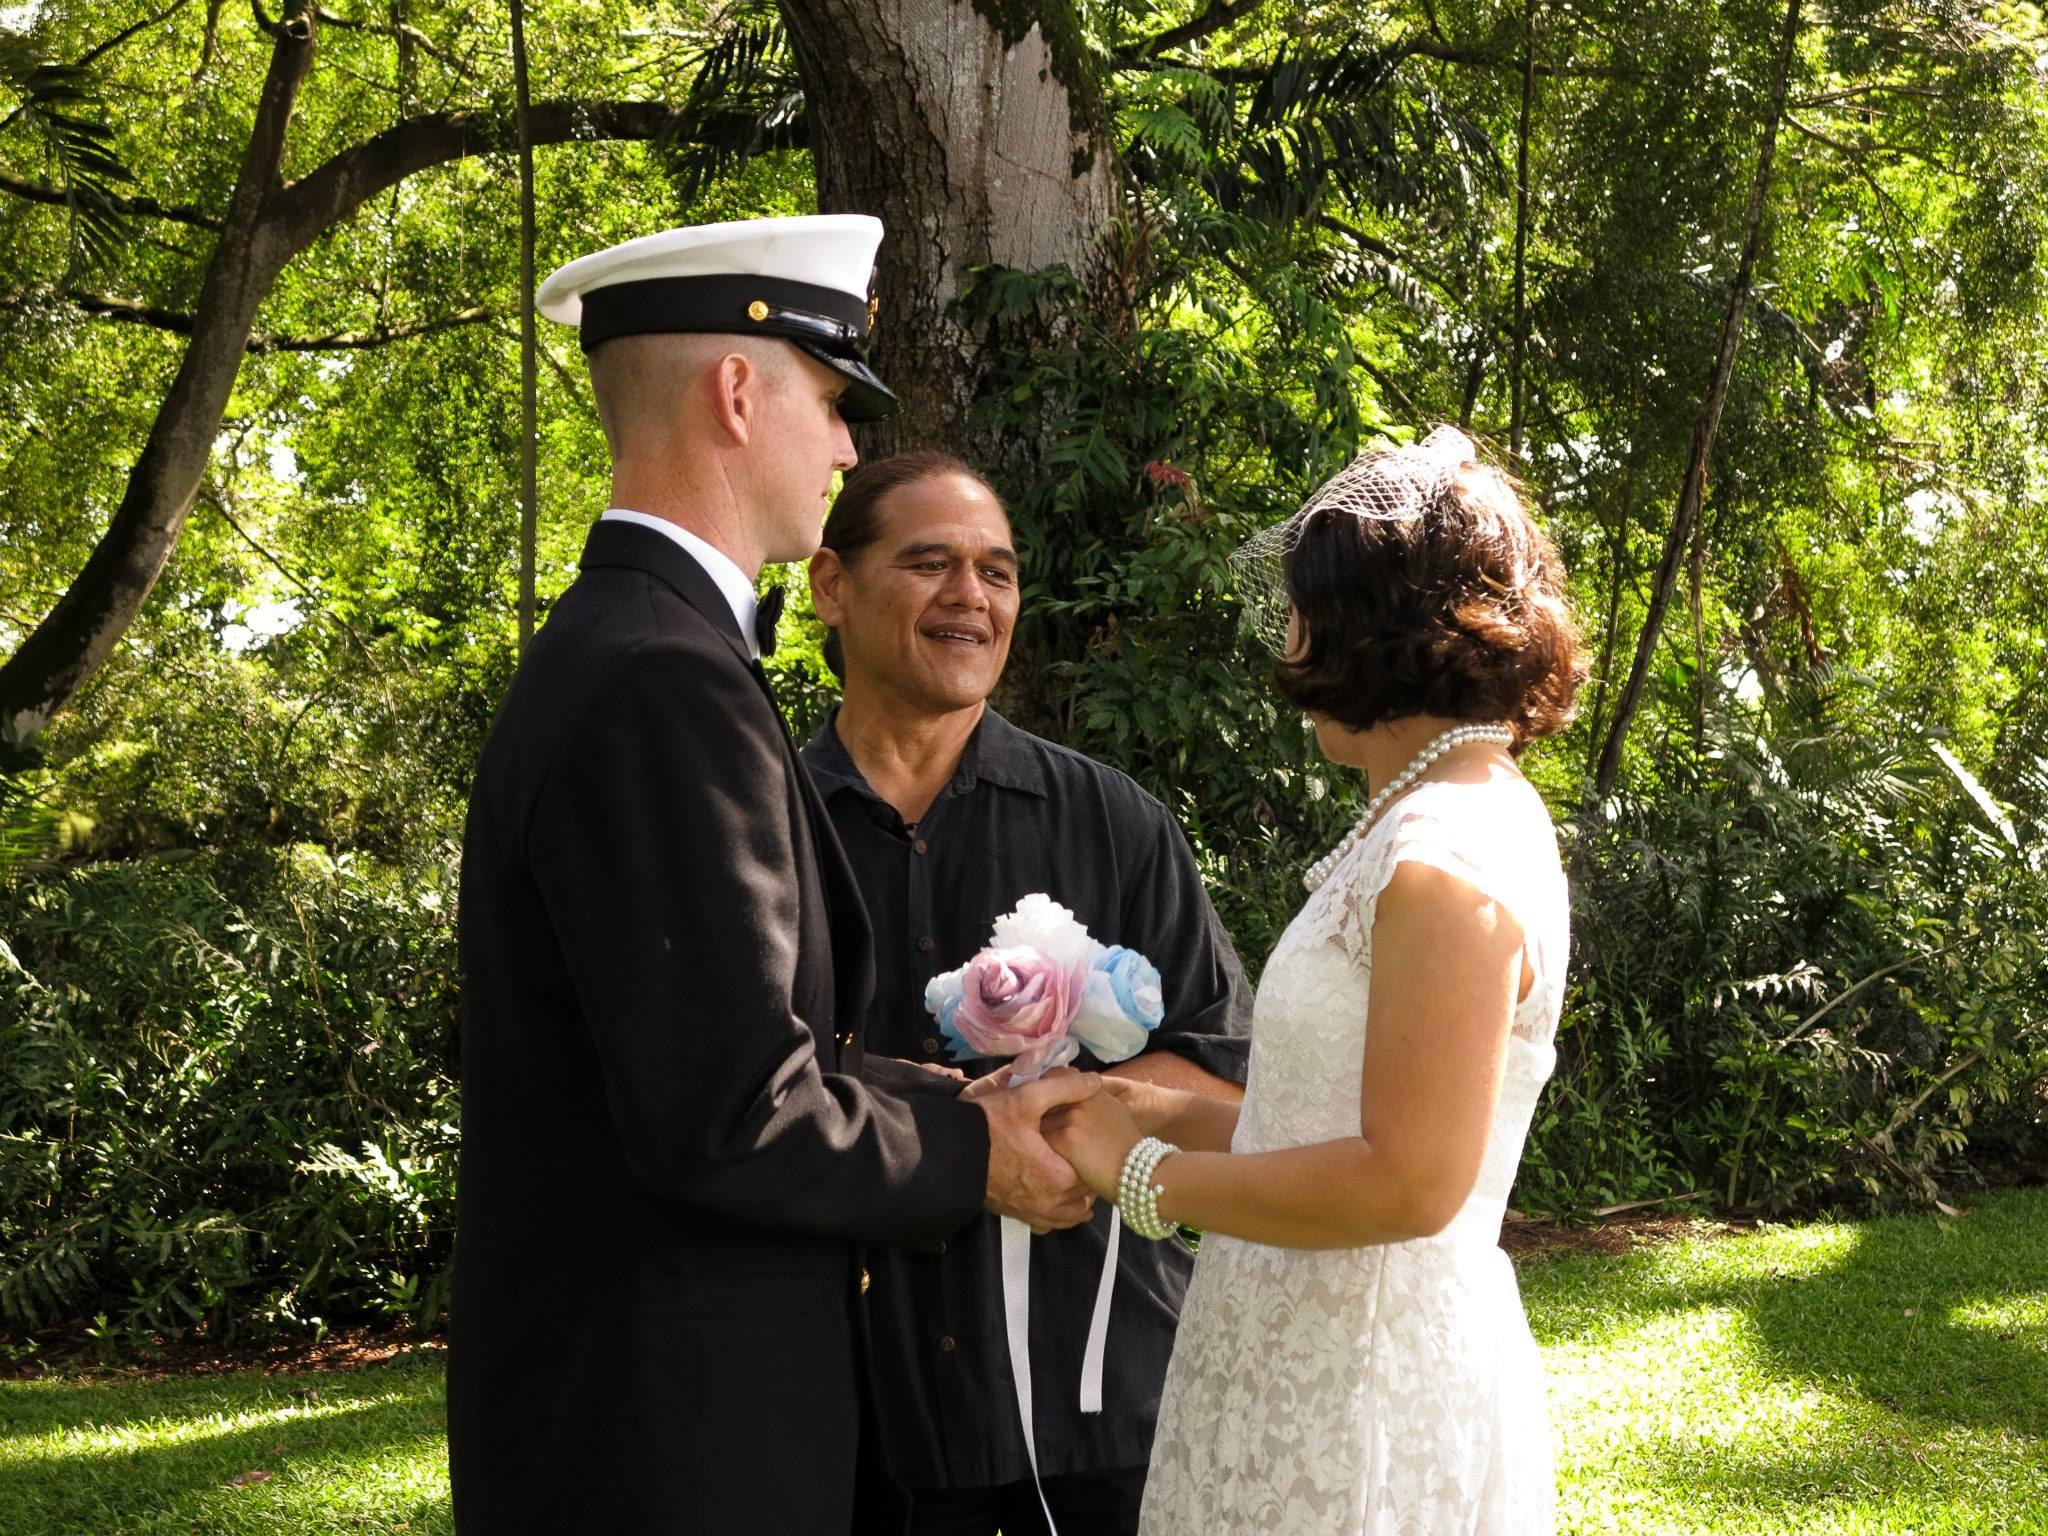 4ec99cff50e1 mand mennesker hawaii bryllup brud Brudgom ceremoni pakker